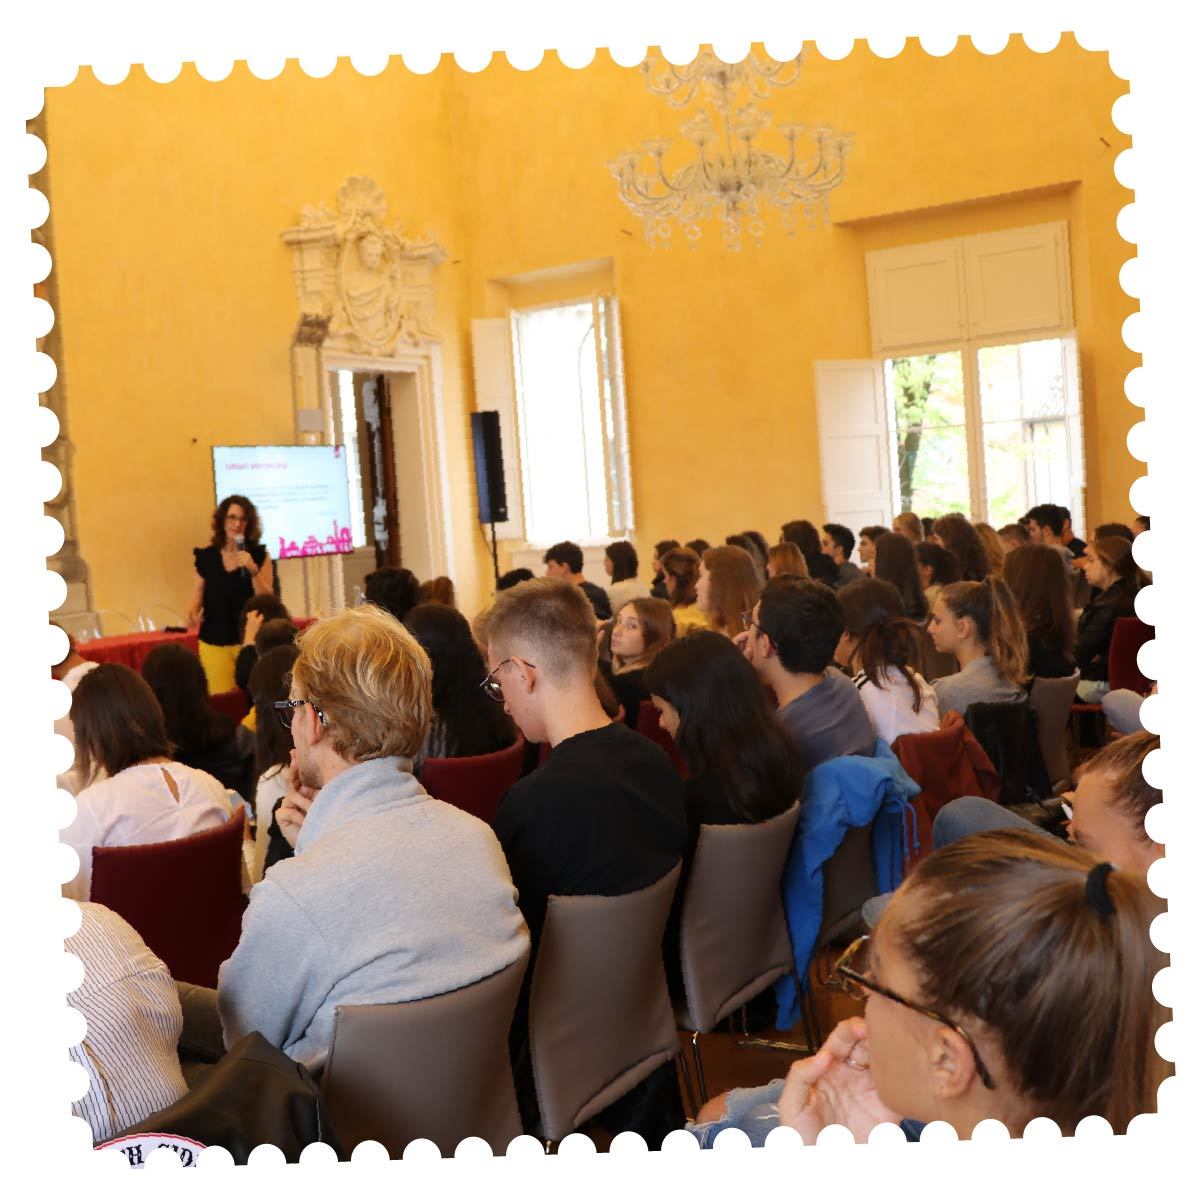 festival-itaca-strategia-eventi-turismo-sostenibile-sponsor-ravenna-4